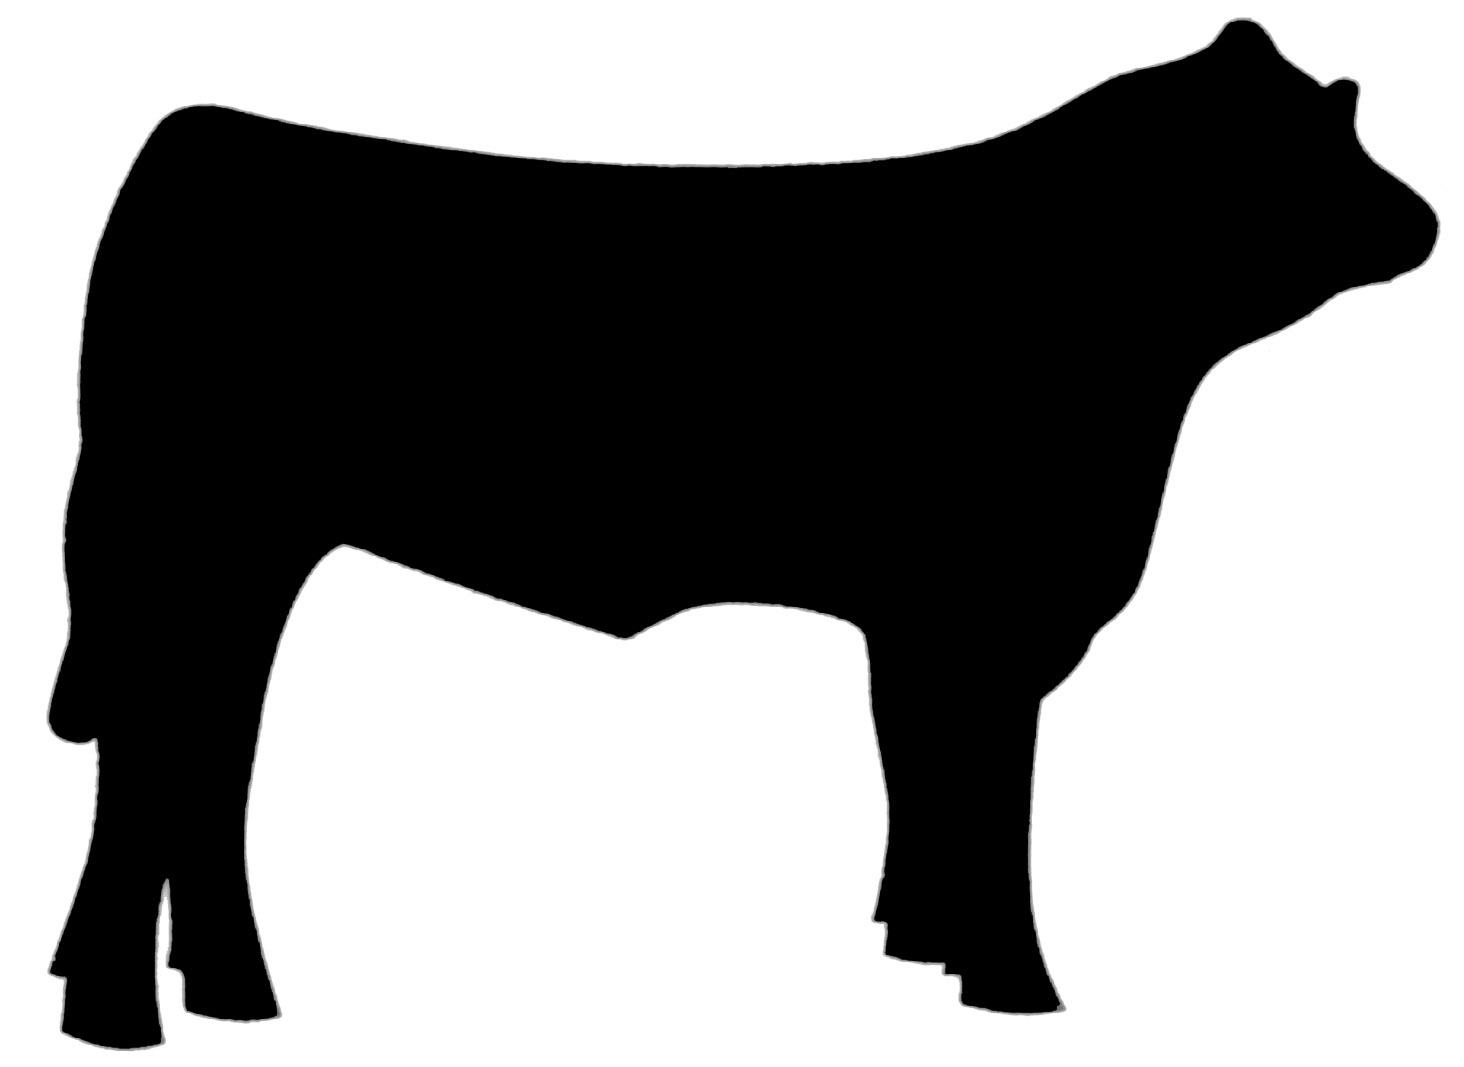 cow silhouette clip art. 9d62175f8c073d673784d0164da02a .